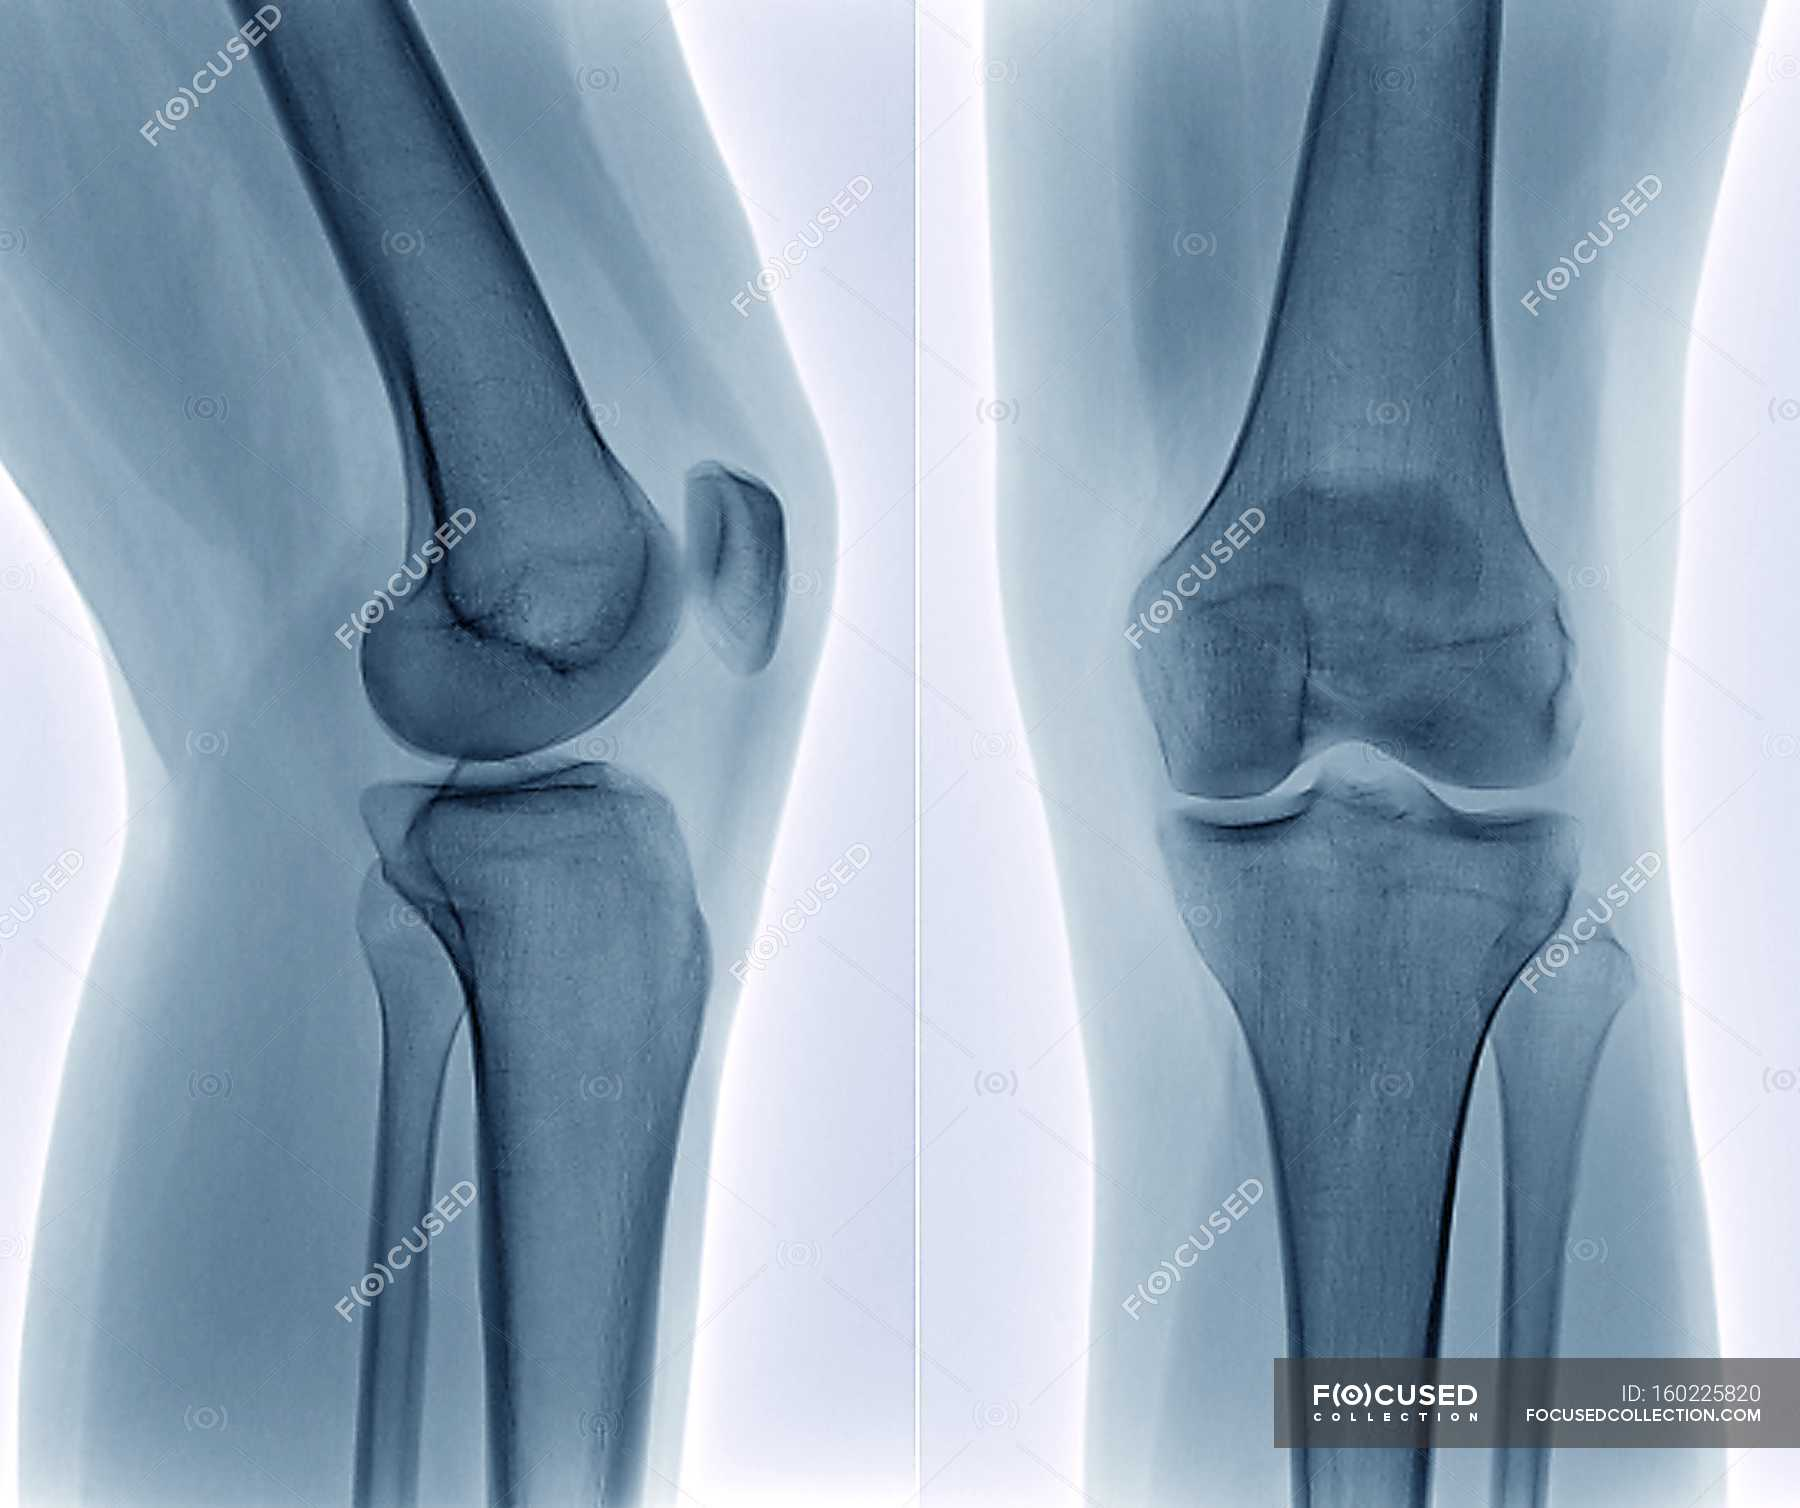 Healthy knee joint anatomy — Stock Photo | #160225820